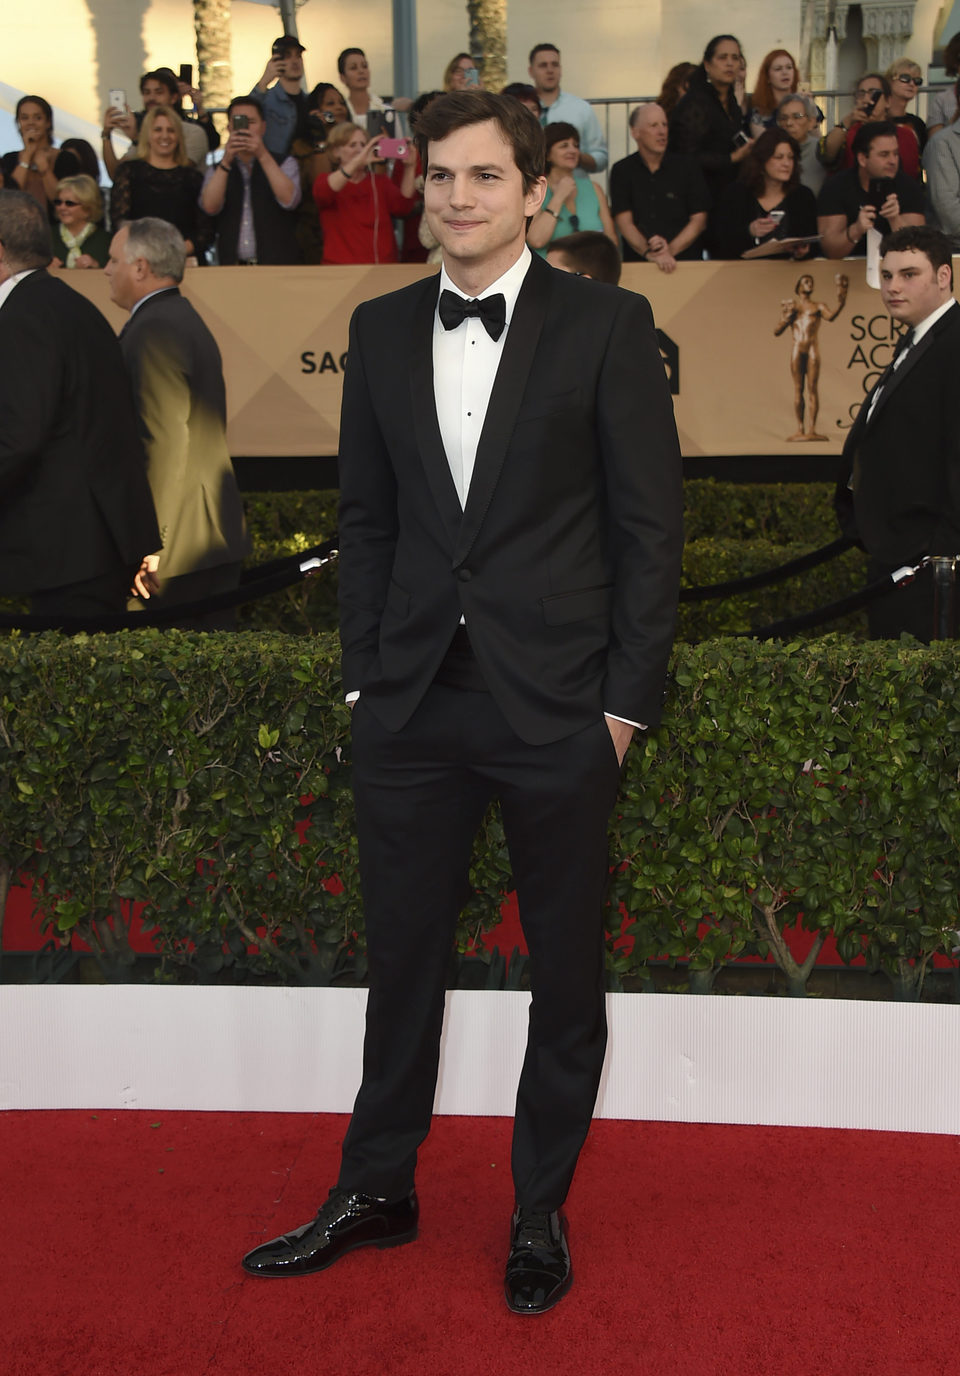 Ashton Kutcher en la alfombra roja de los SAG Awards 2017